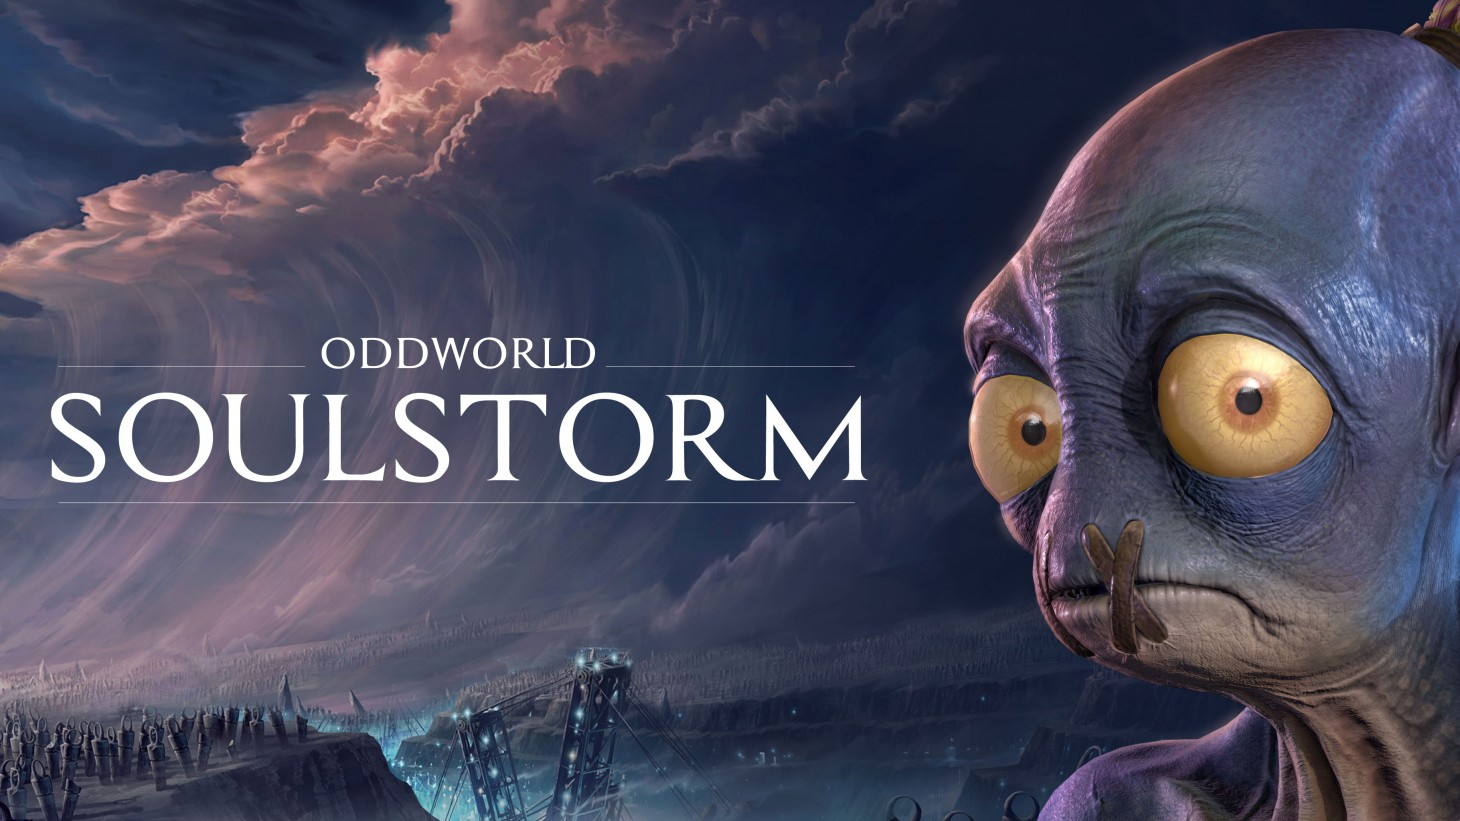 Oddworld Soulstorm Free Download